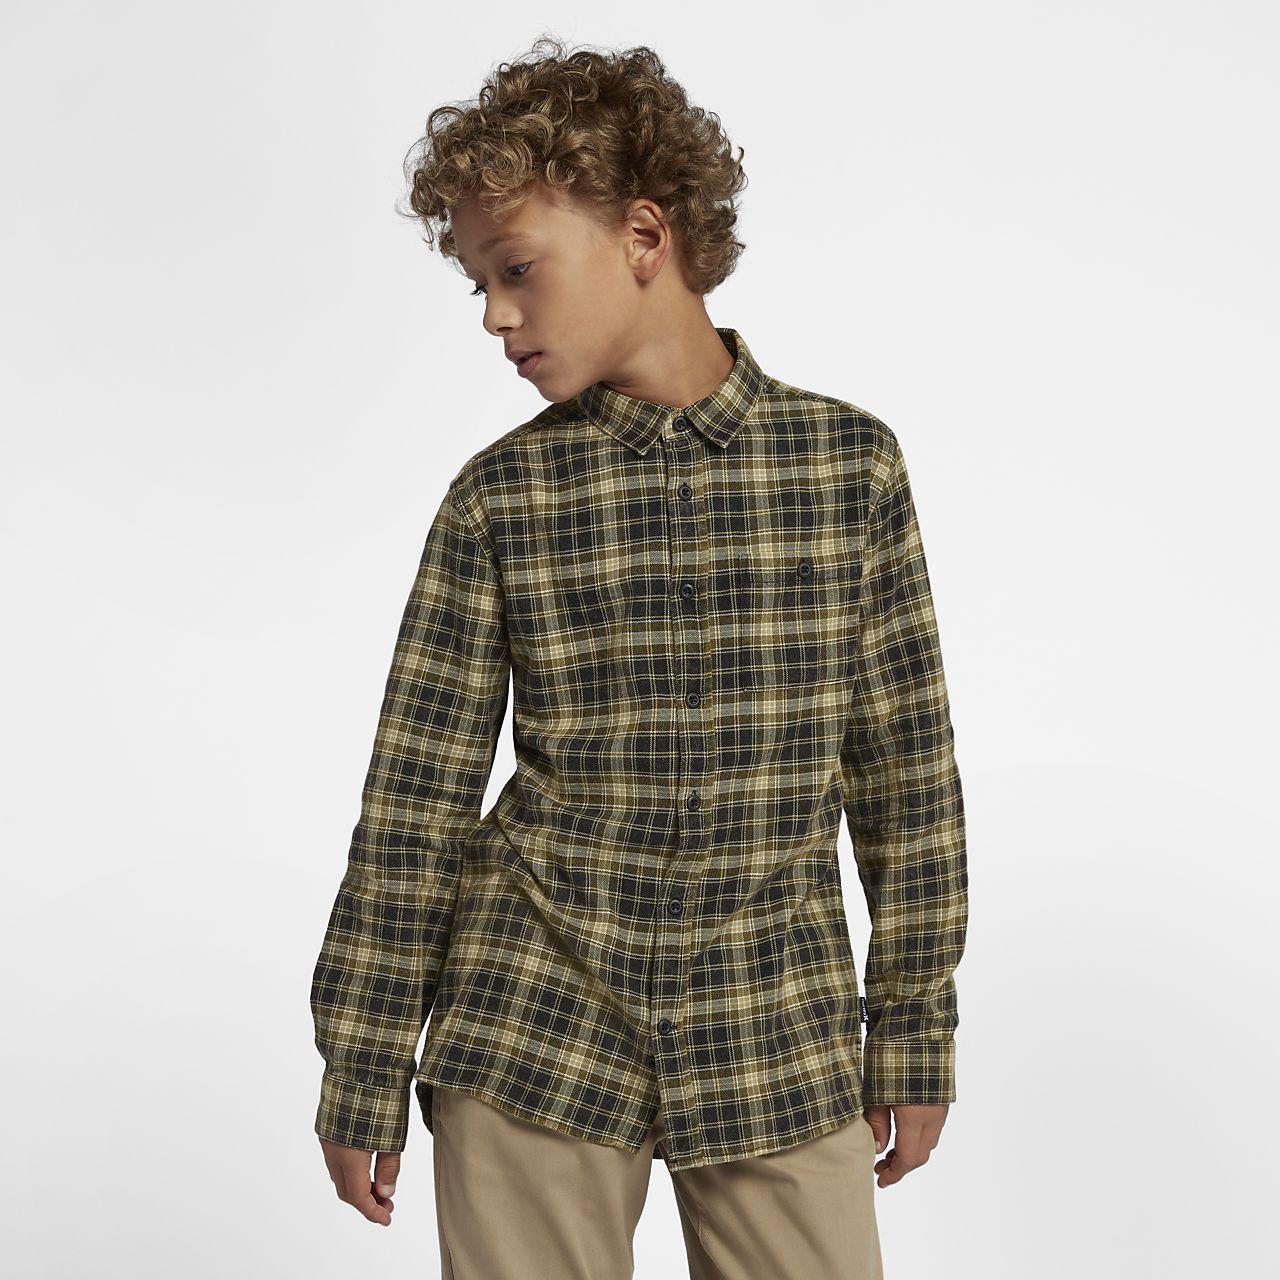 Hurley Ranger Boys' Woven Long-Sleeve Top